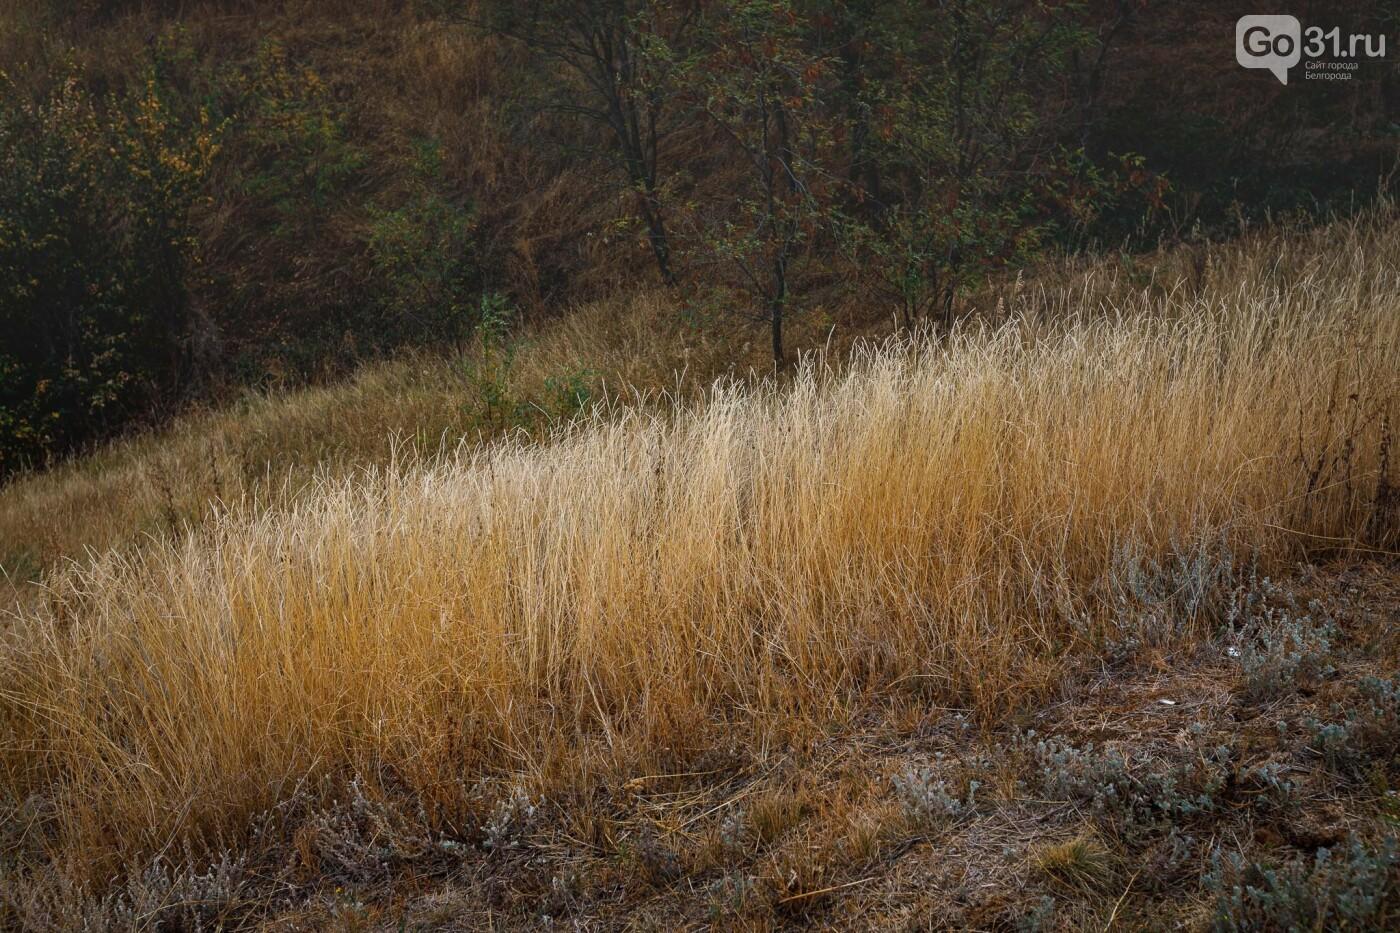 Хотмыжск – по-осеннему. Фоторепортаж, фото-13, Фото: Антон Вергун